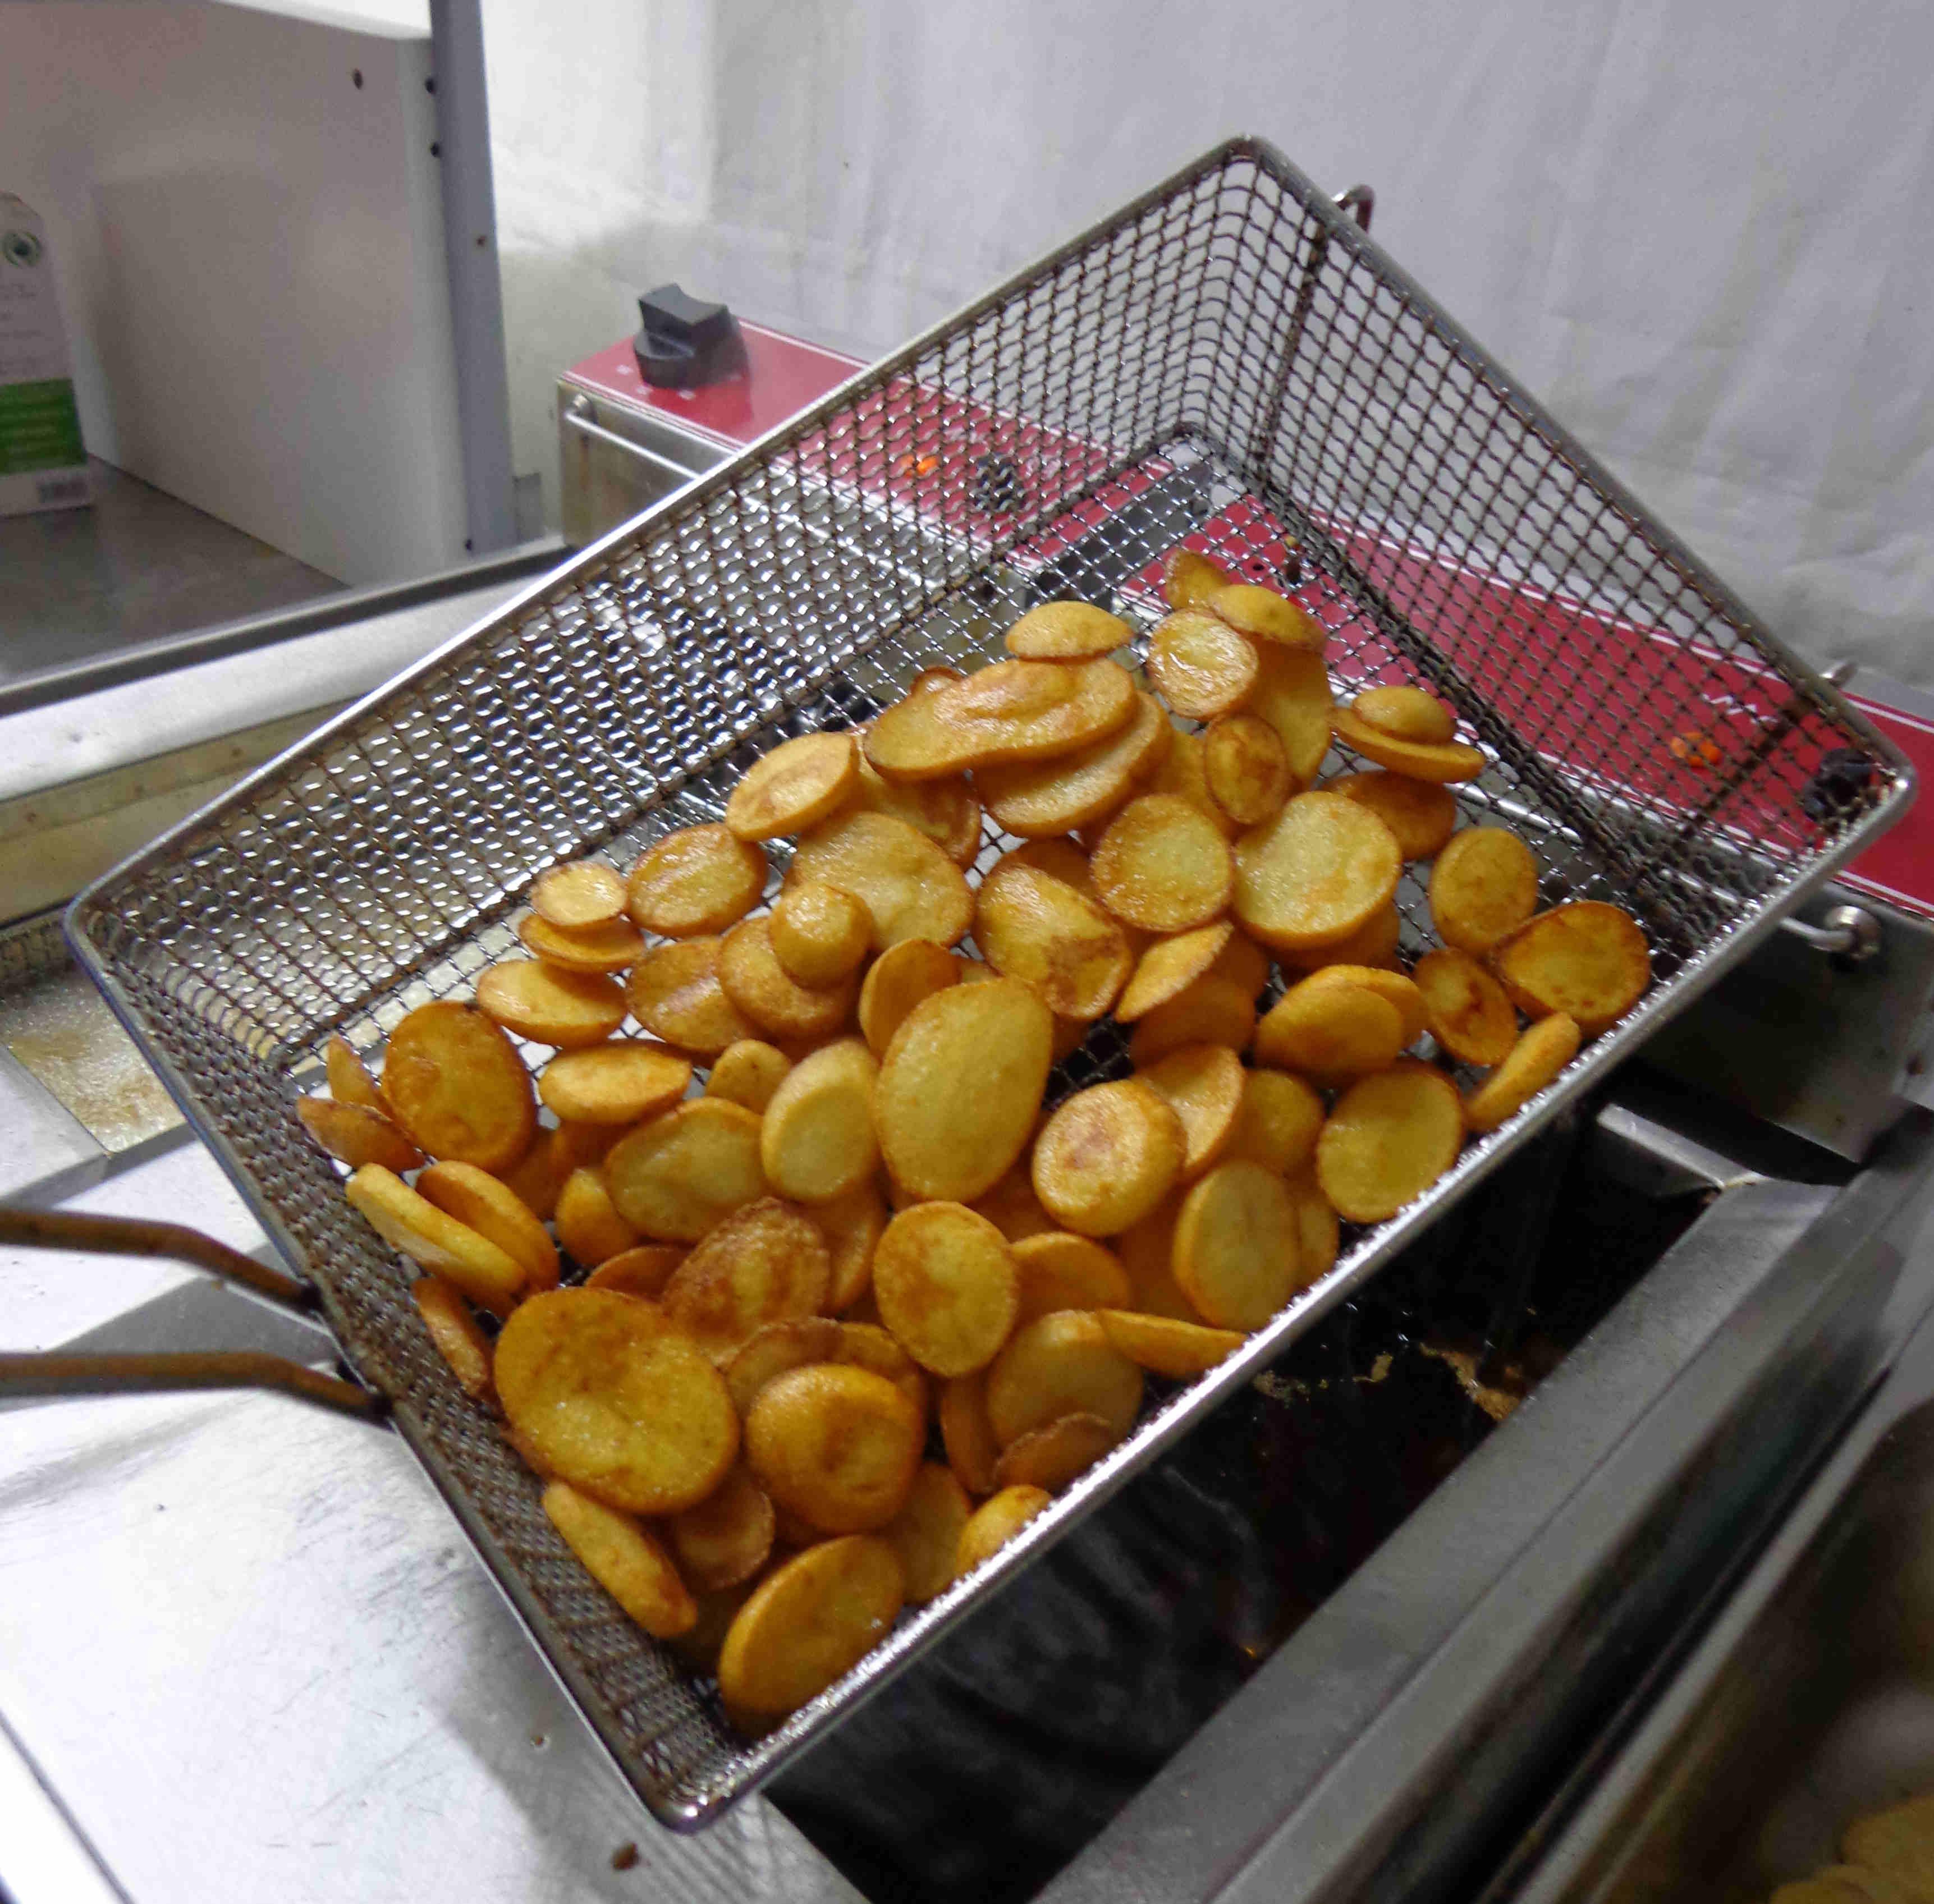 Neu bei Bauer Baurkard: unsere leckeren Kartoffel-Chips